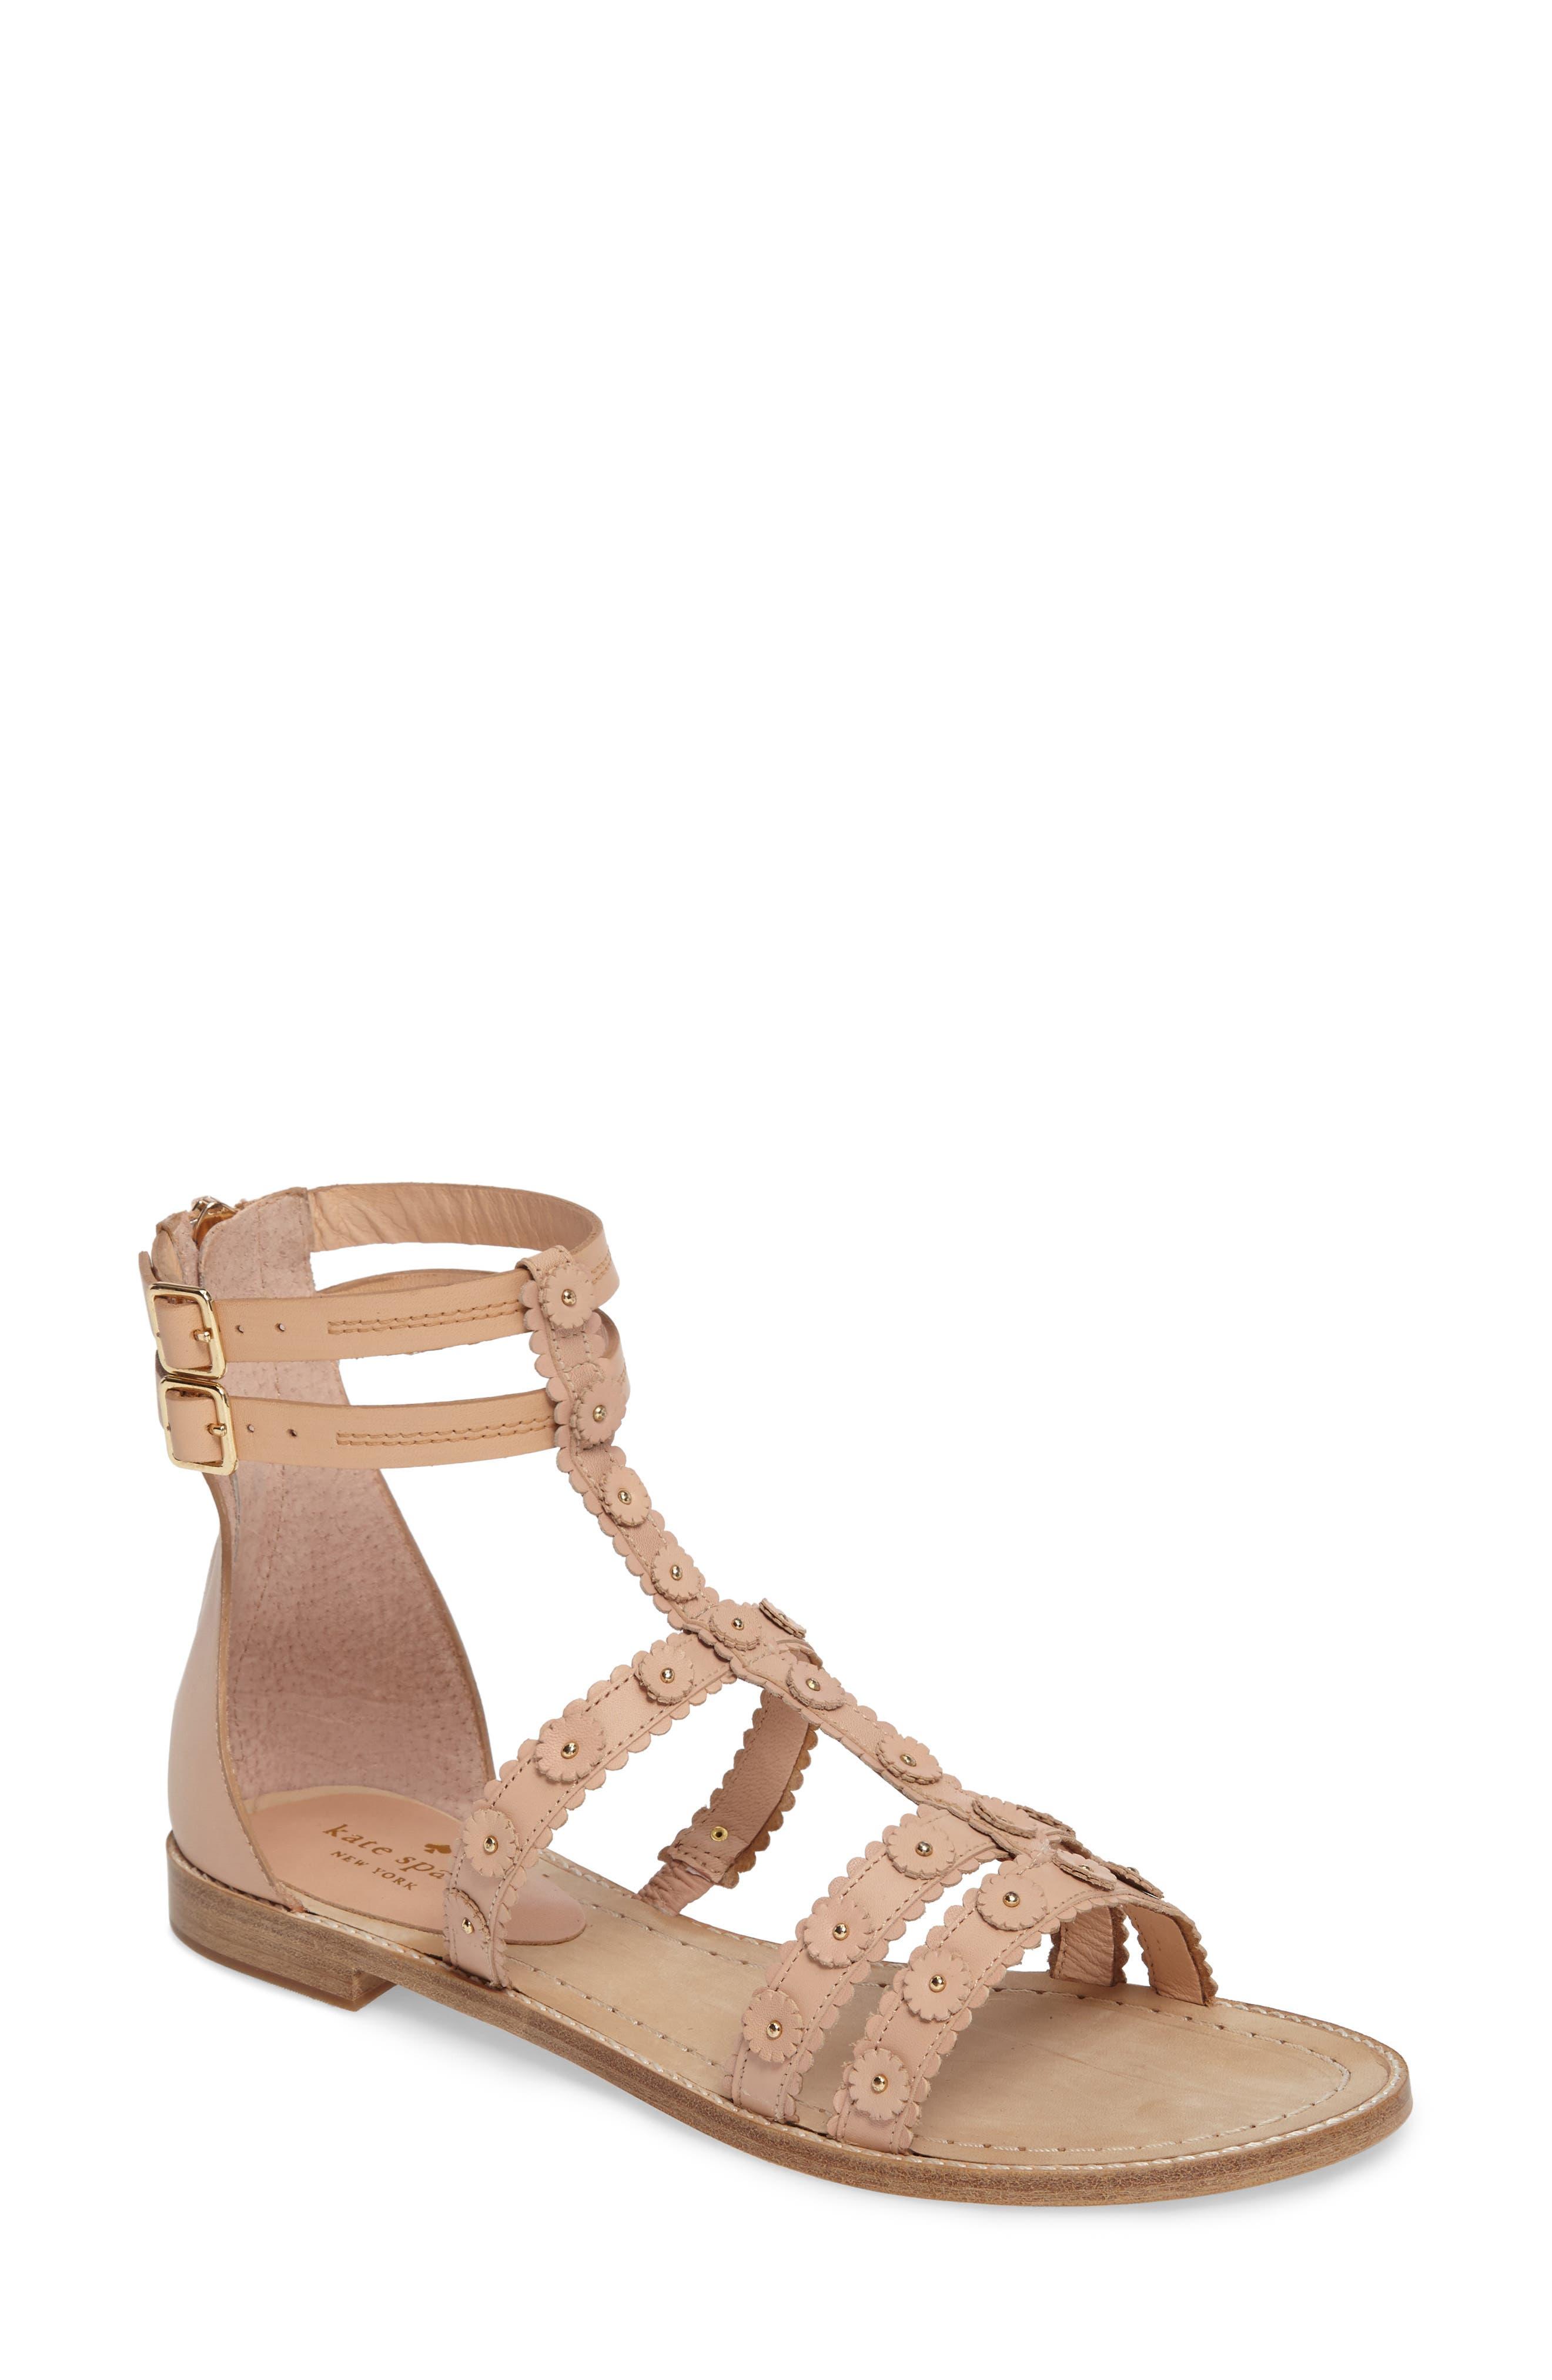 Alternate Image 1 Selected - kate spade new york santina sandal (Women)